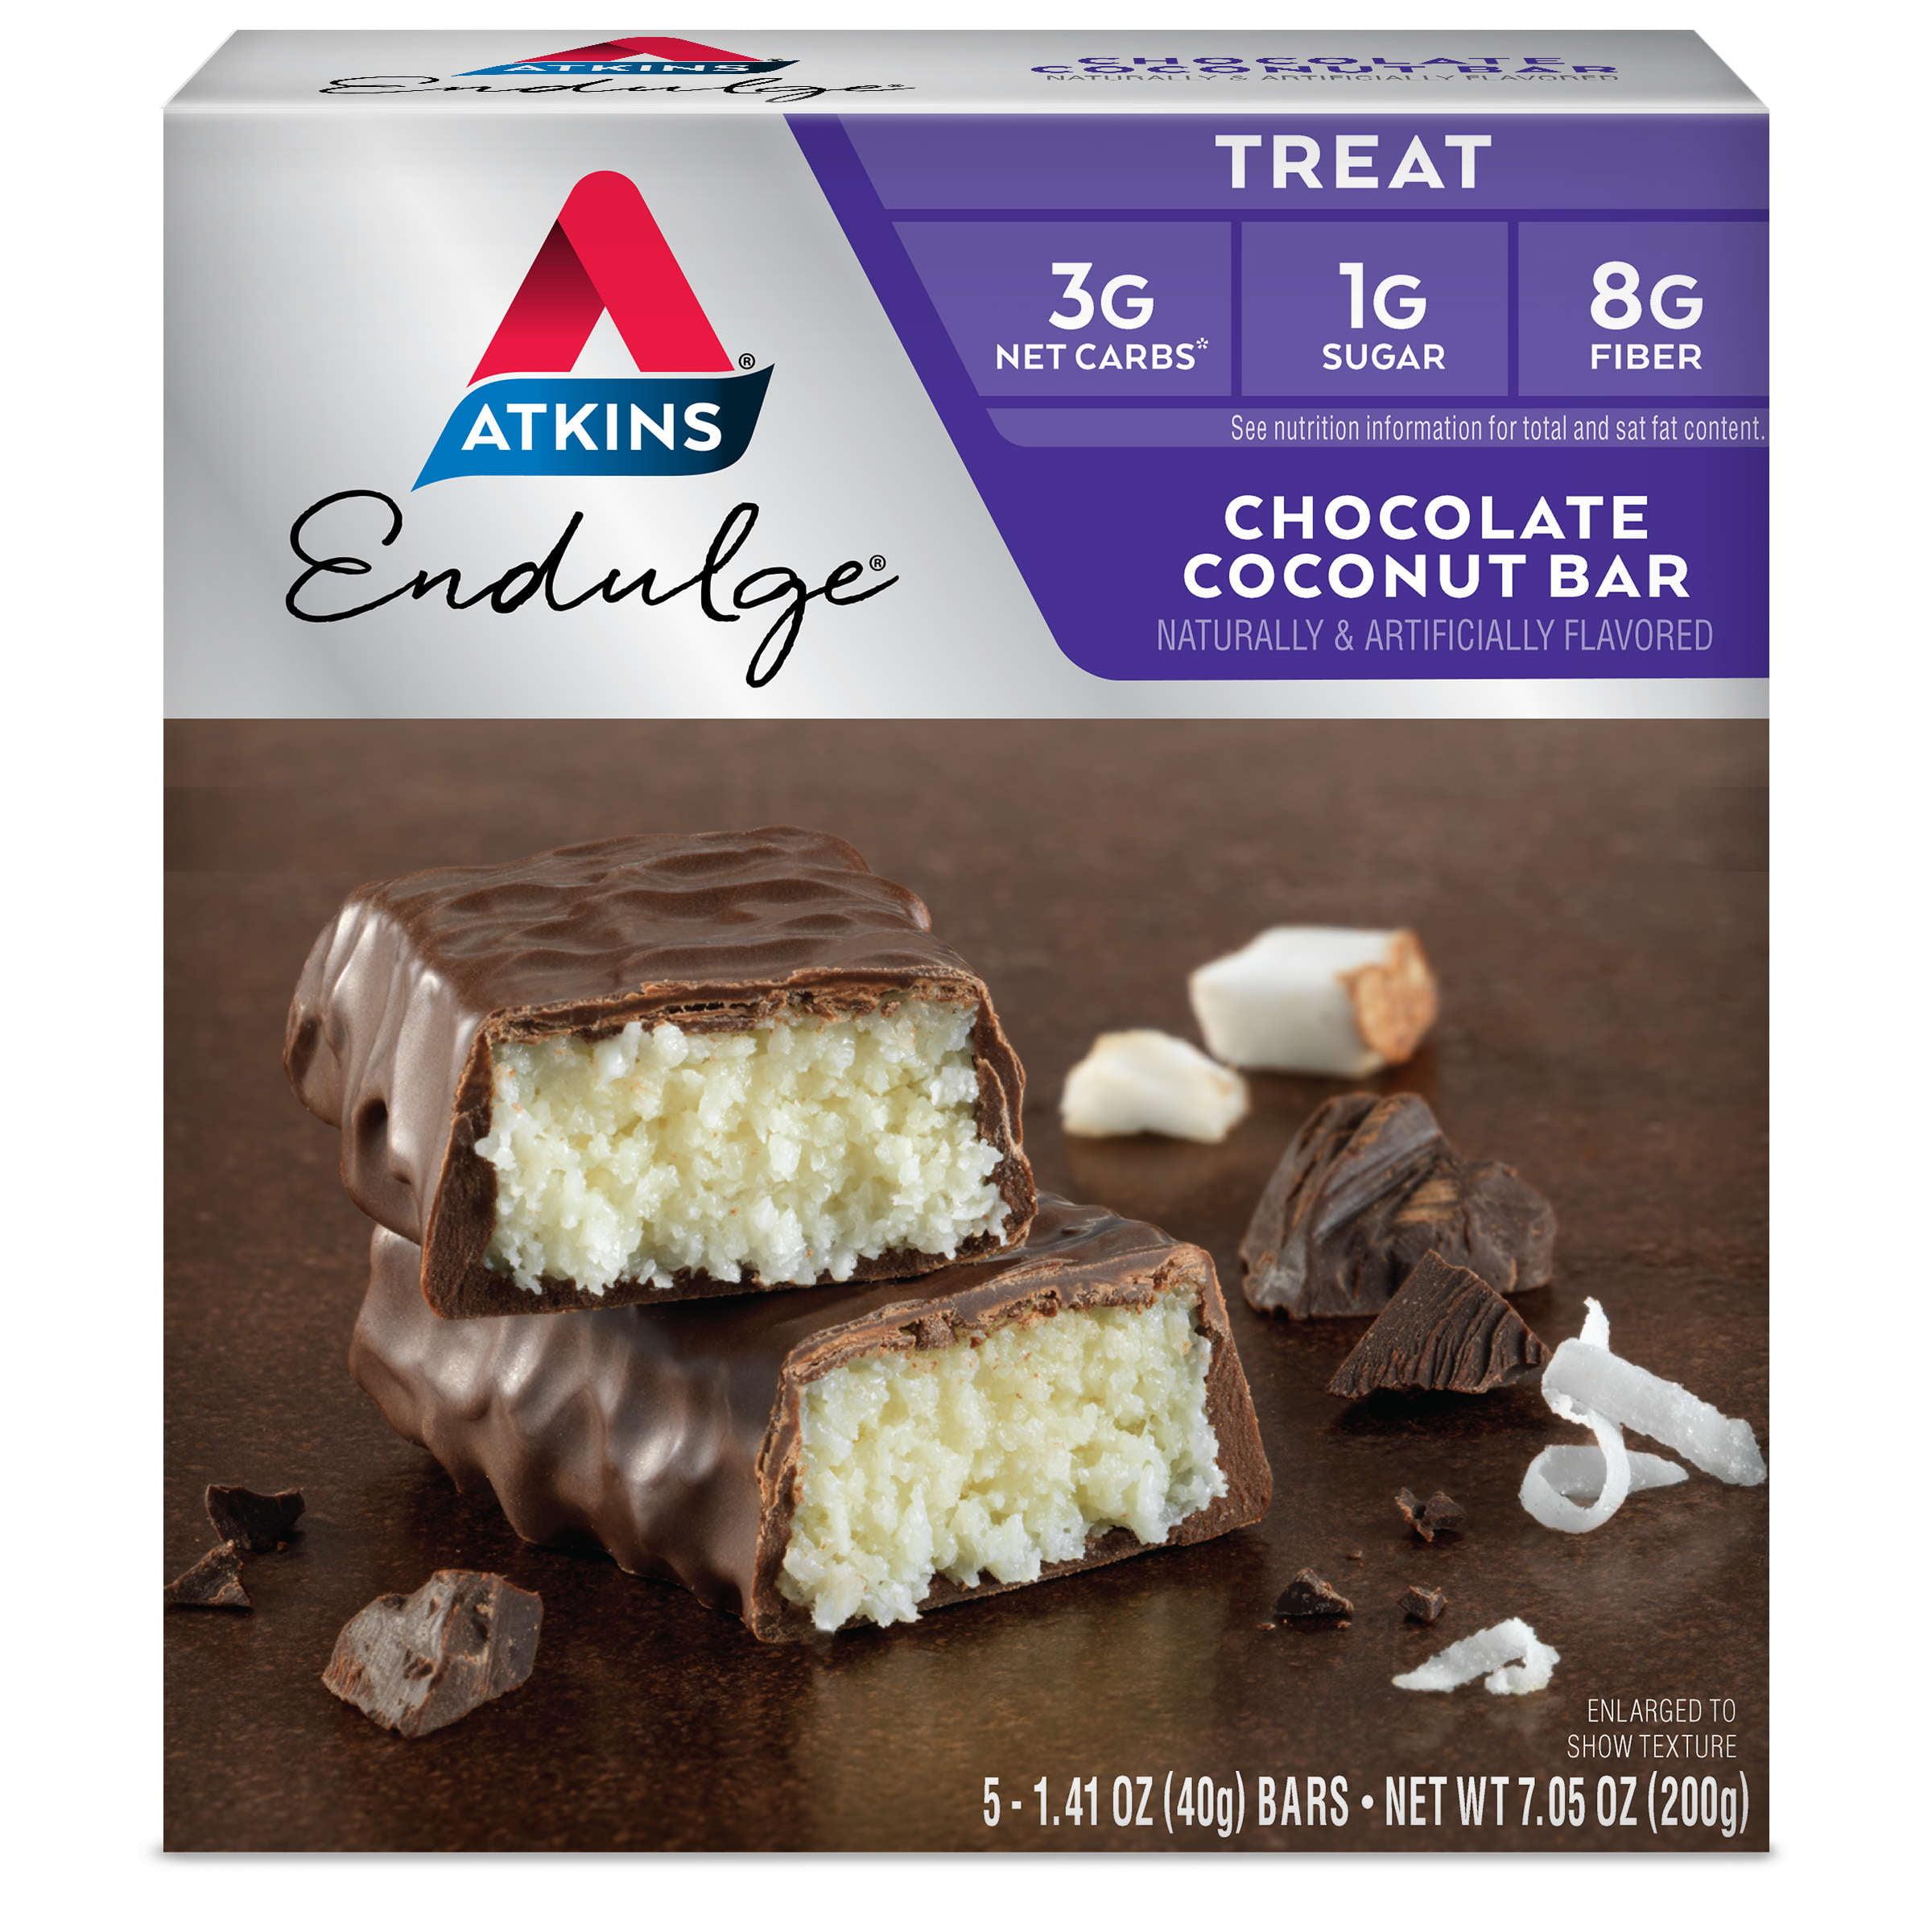 Atkins Endulge Chocolate Coconut Bar, 1.4oz, 5-pack (Treat)